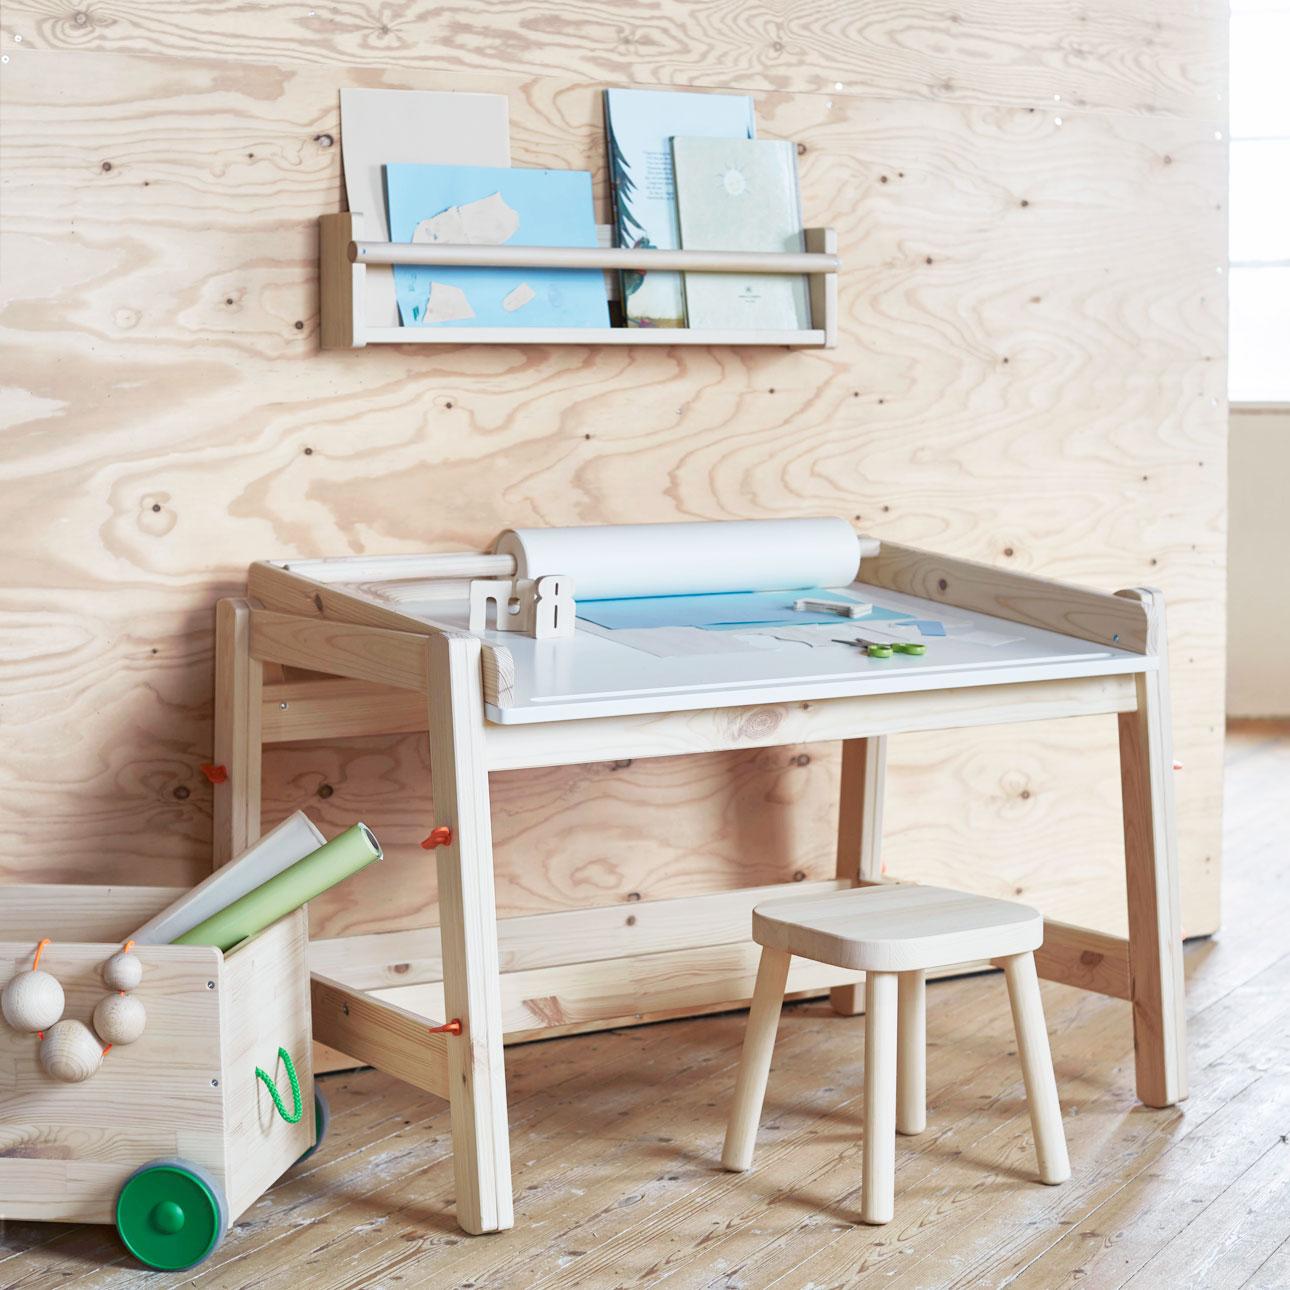 Ikea kinderland mooi hout is niet lelijk - Accessoire bureau ikea ...